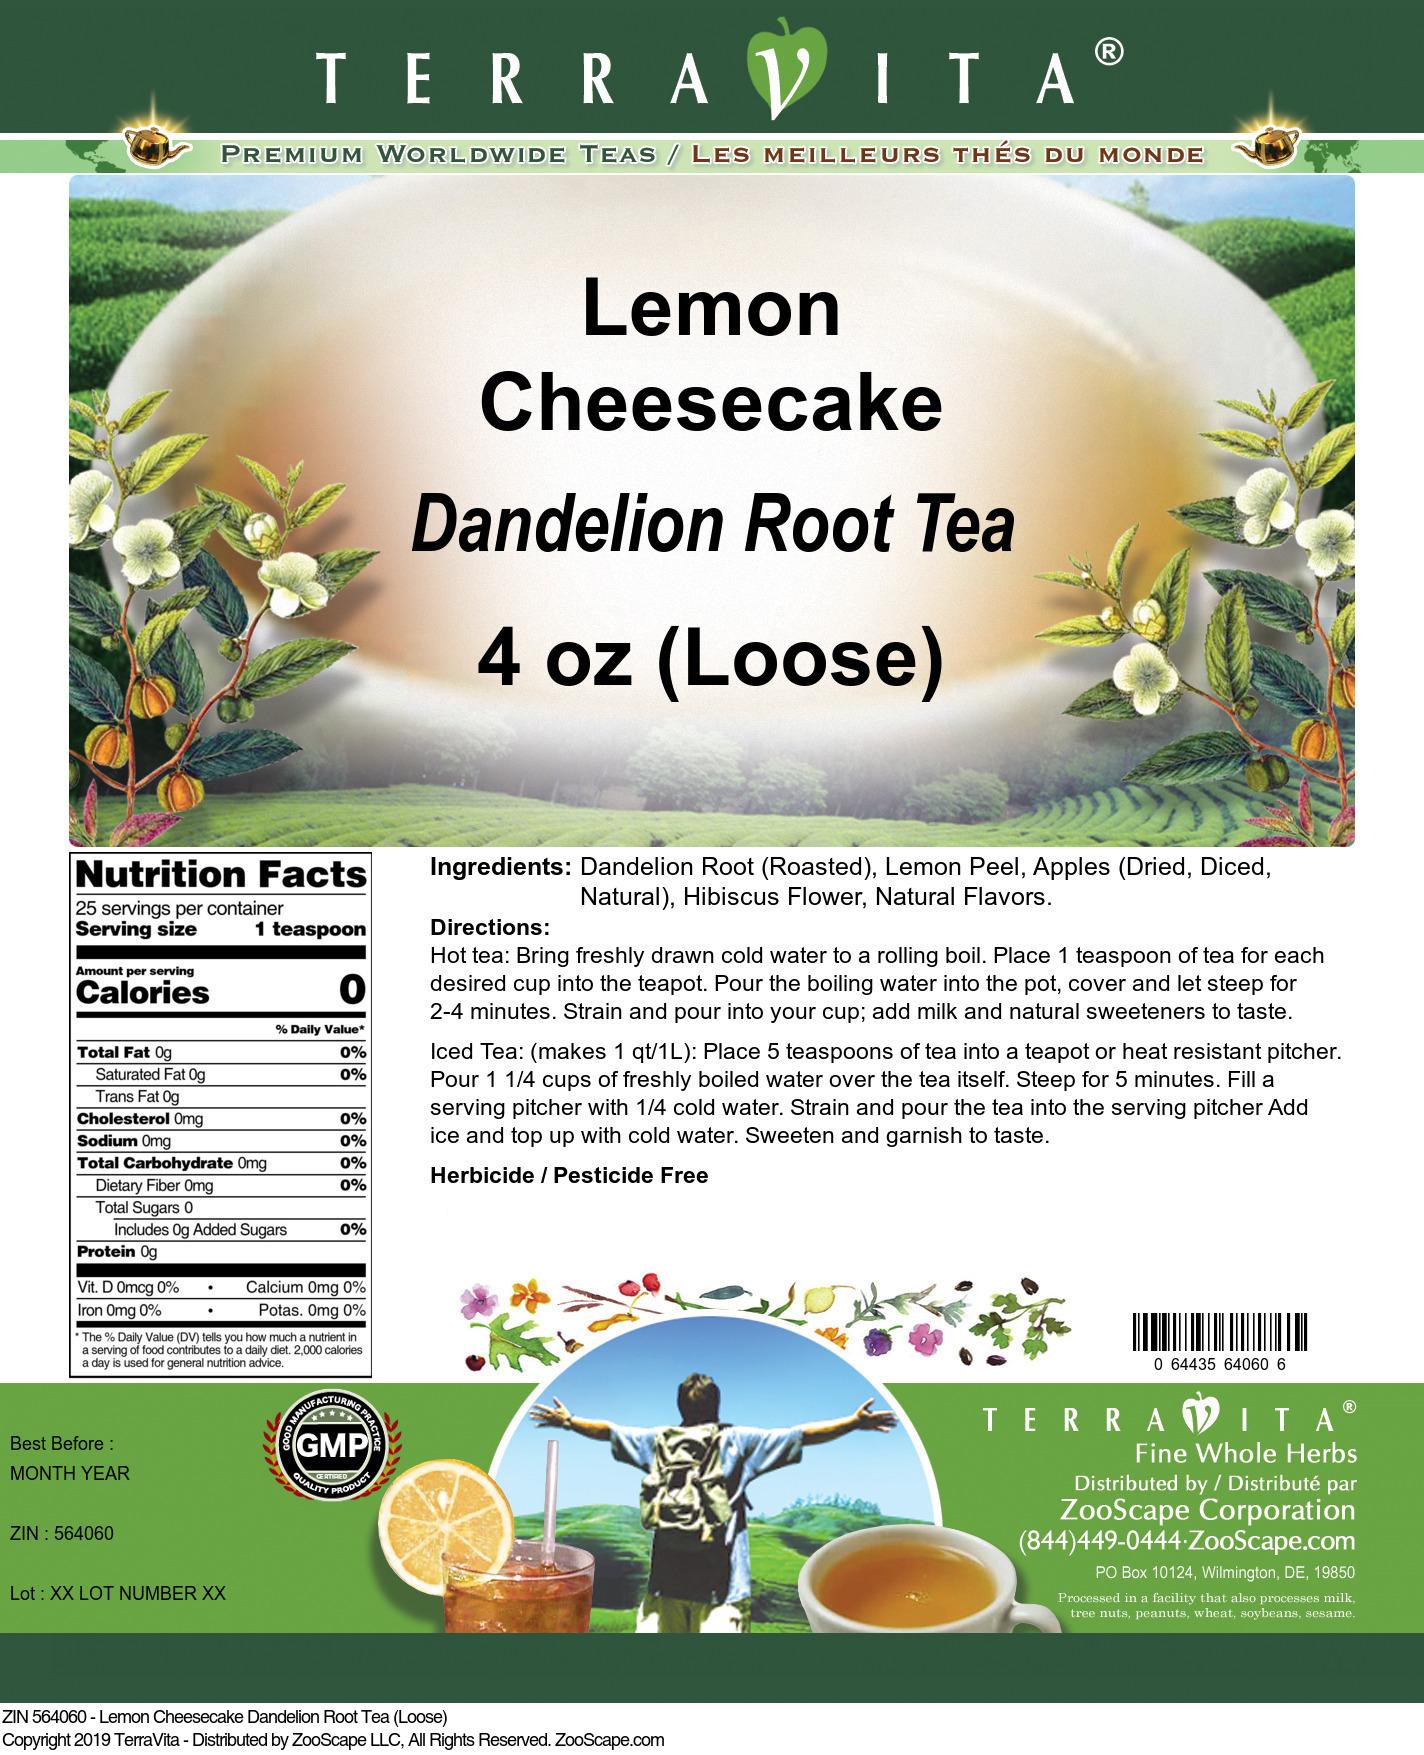 Lemon Cheesecake Dandelion Root